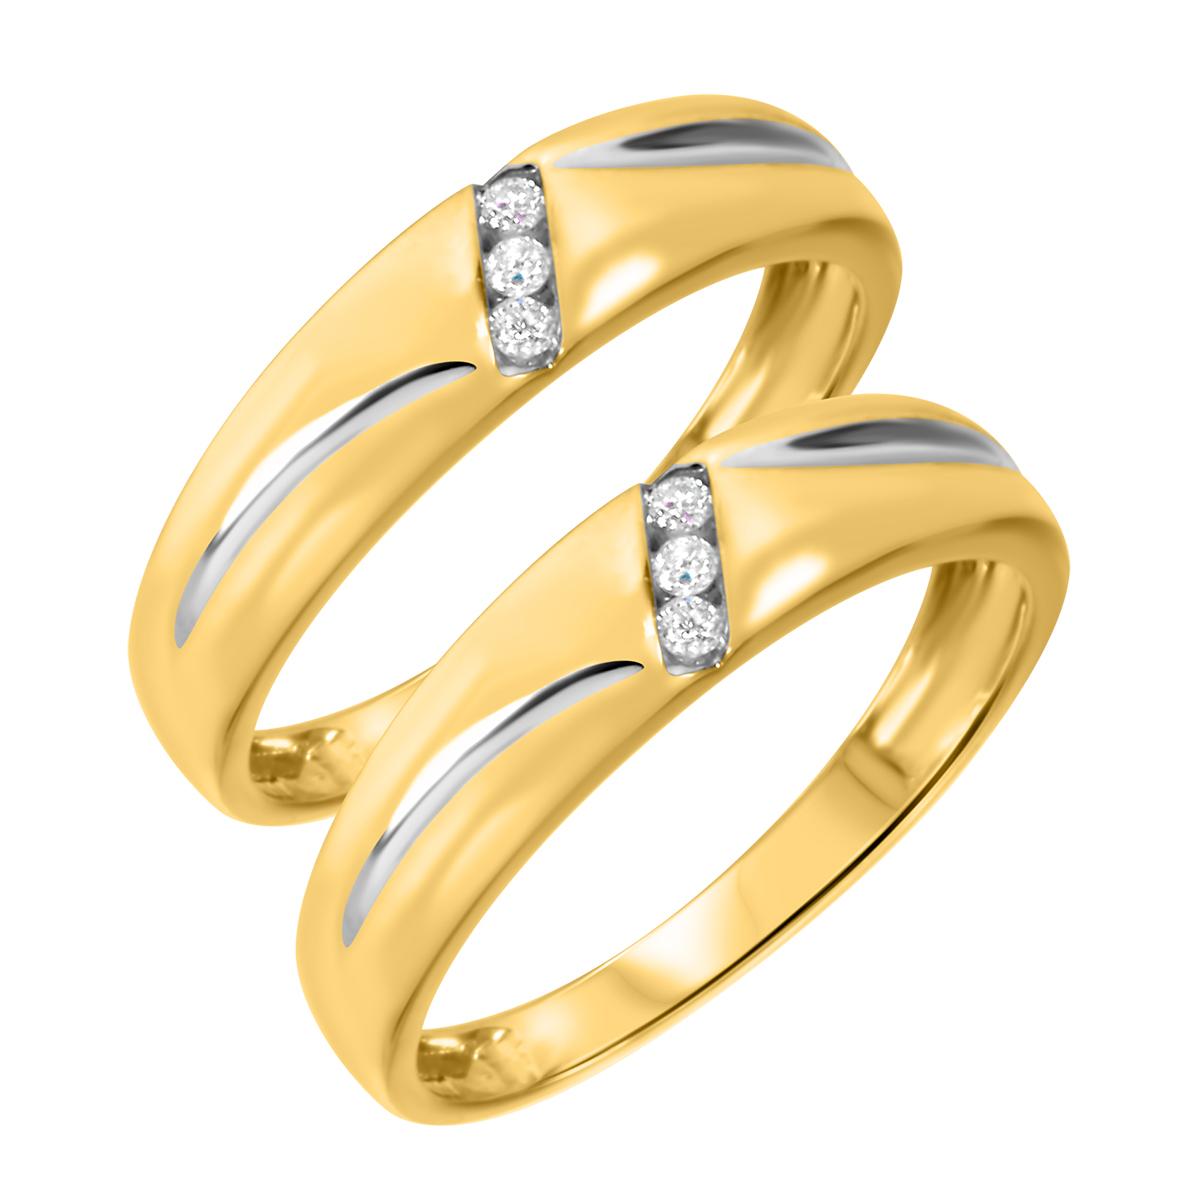 1/15 CT. T.W. Round Cut Ladies Same Sex Wedding Band Set 14K Yellow Gold- Size 8